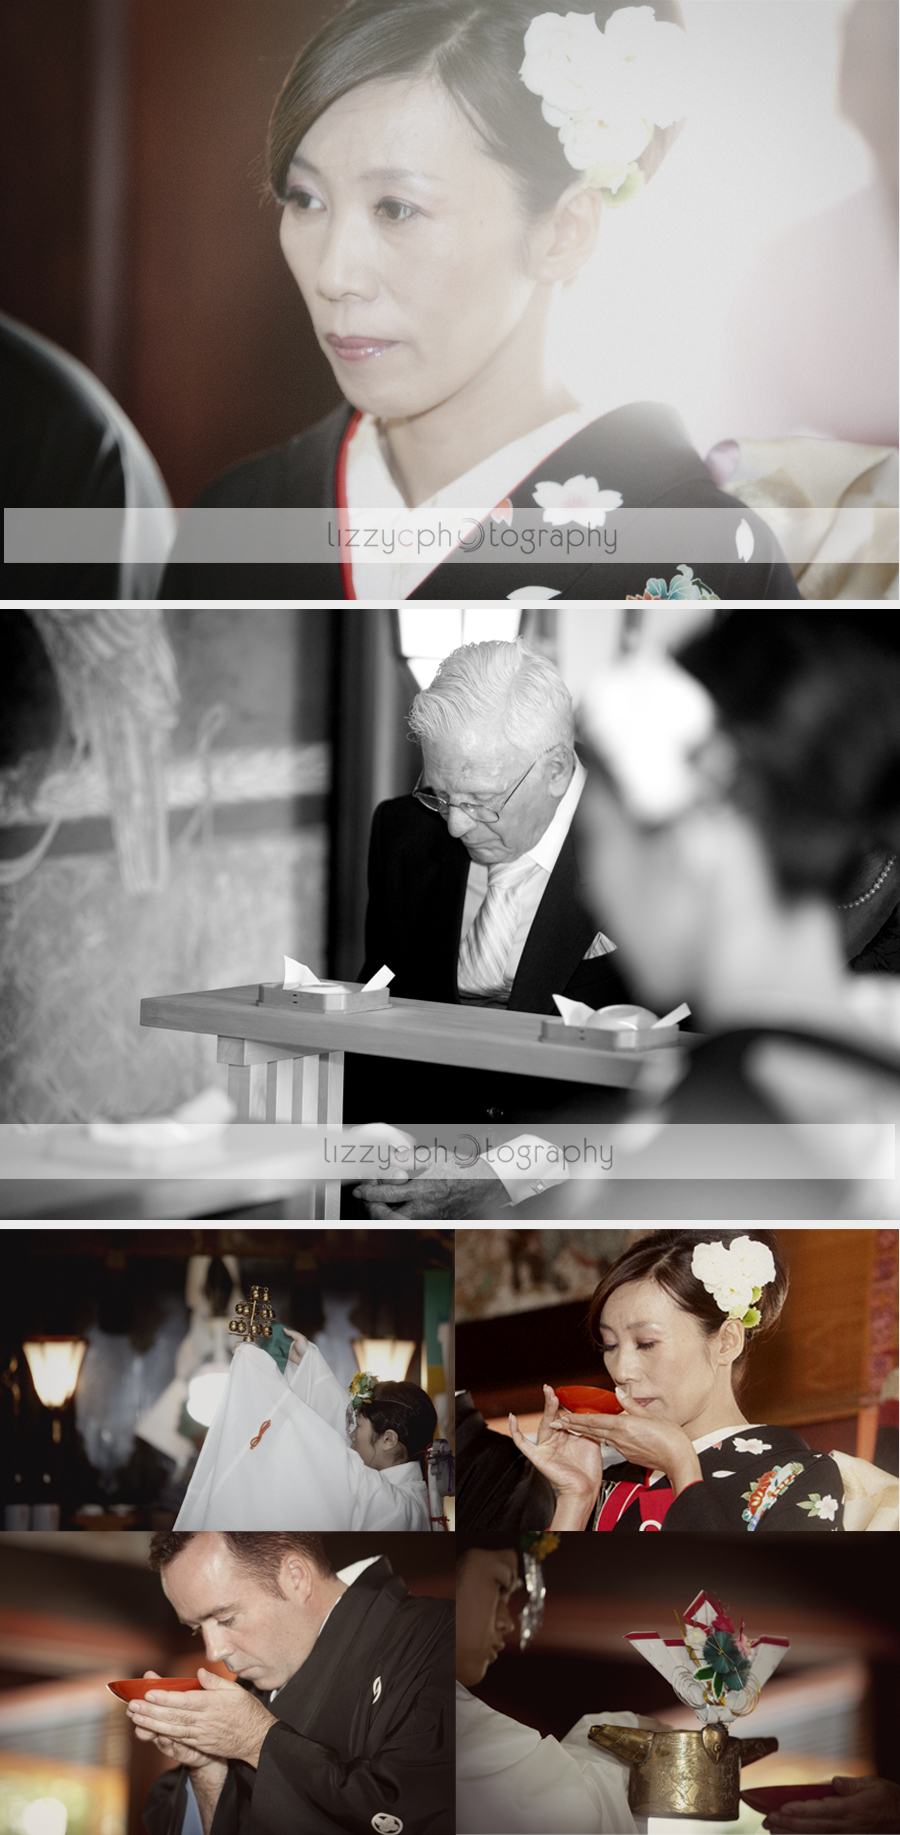 shinto wedding Japan photography